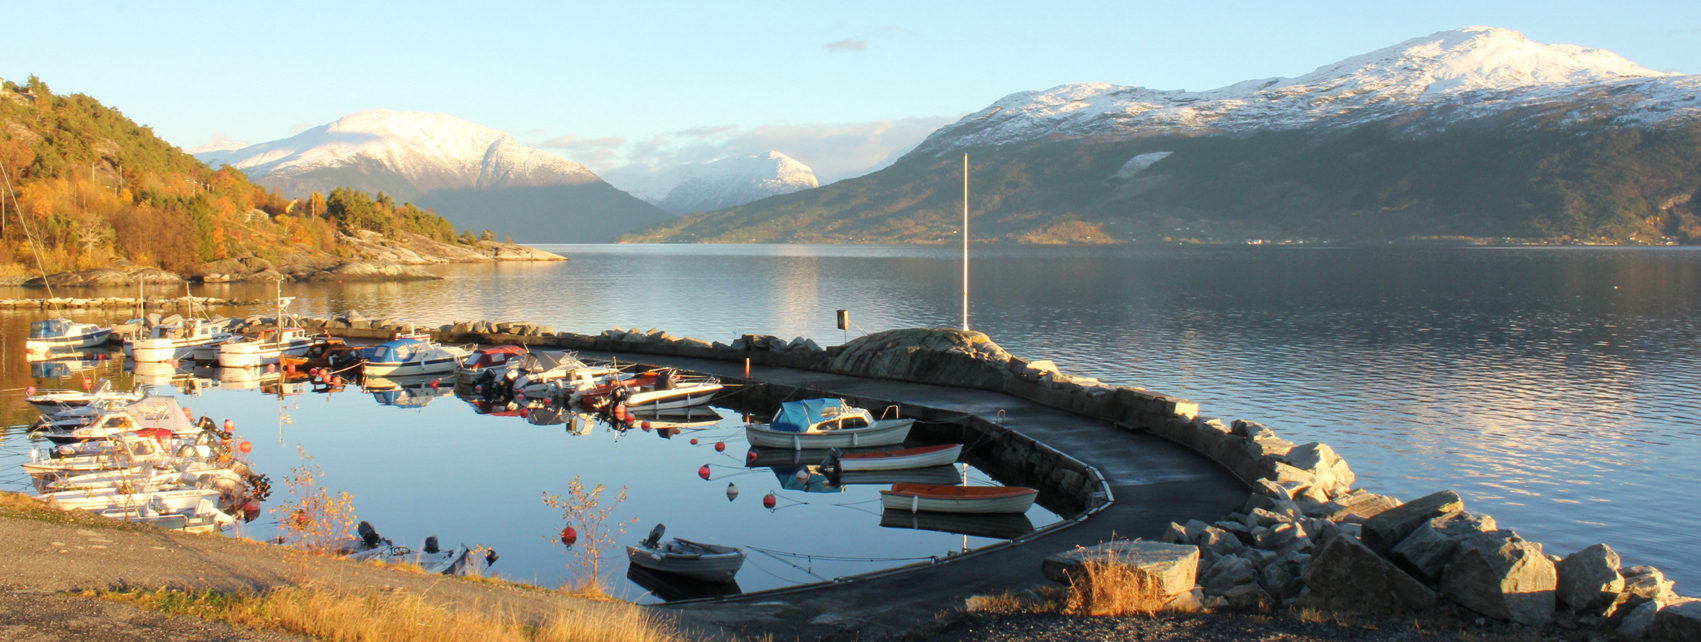 Ålvik harbour